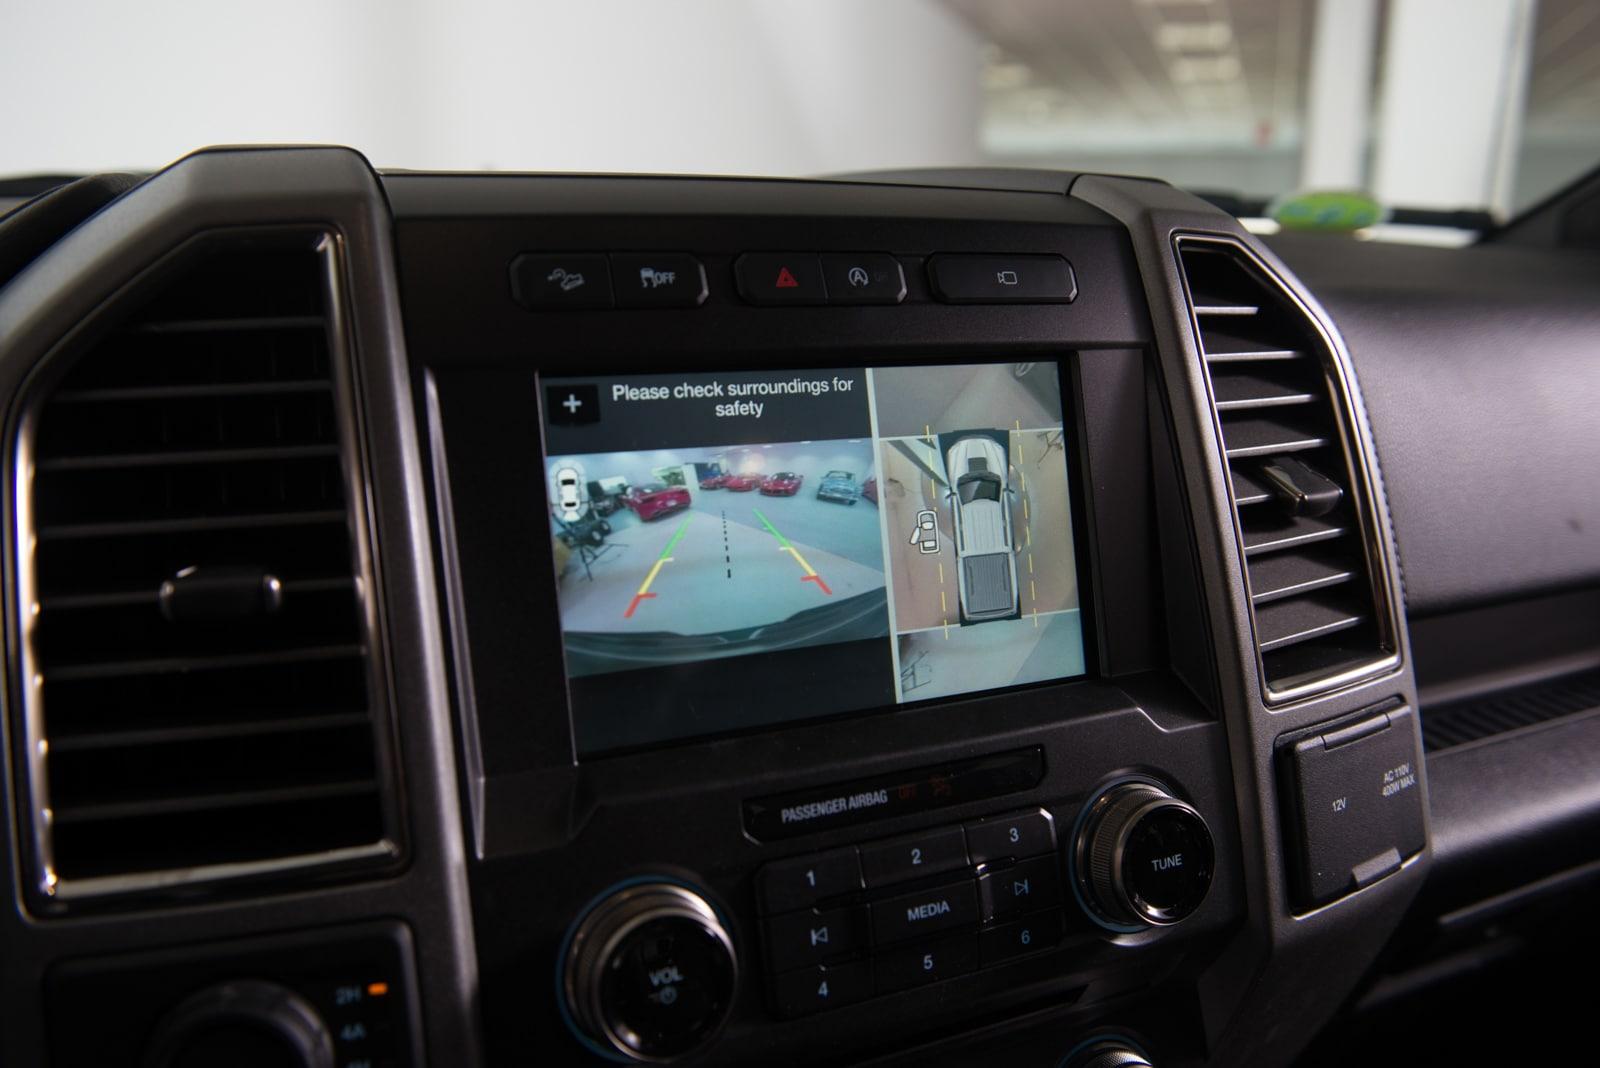 3 5l V6 24v Gdi Dohc Twin Turbo Reviews Autos Post